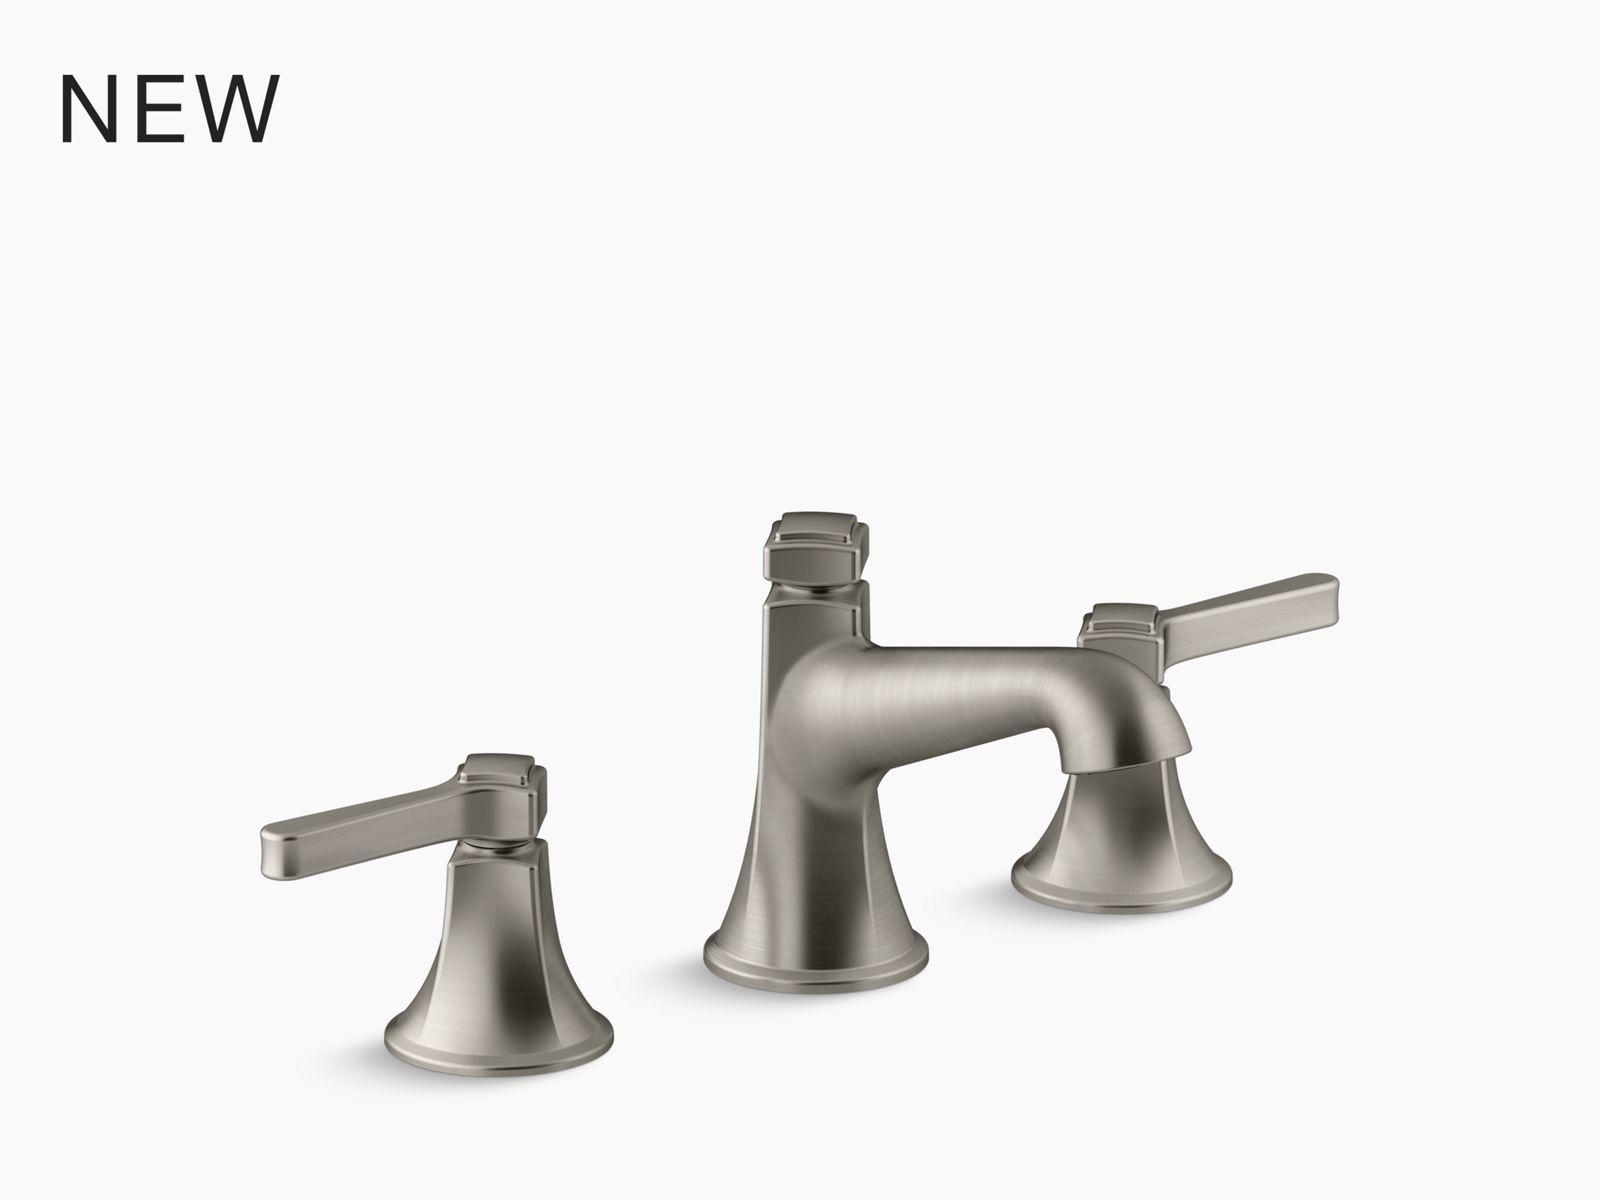 caxton oval 15 x 12 undermount bathroom sink